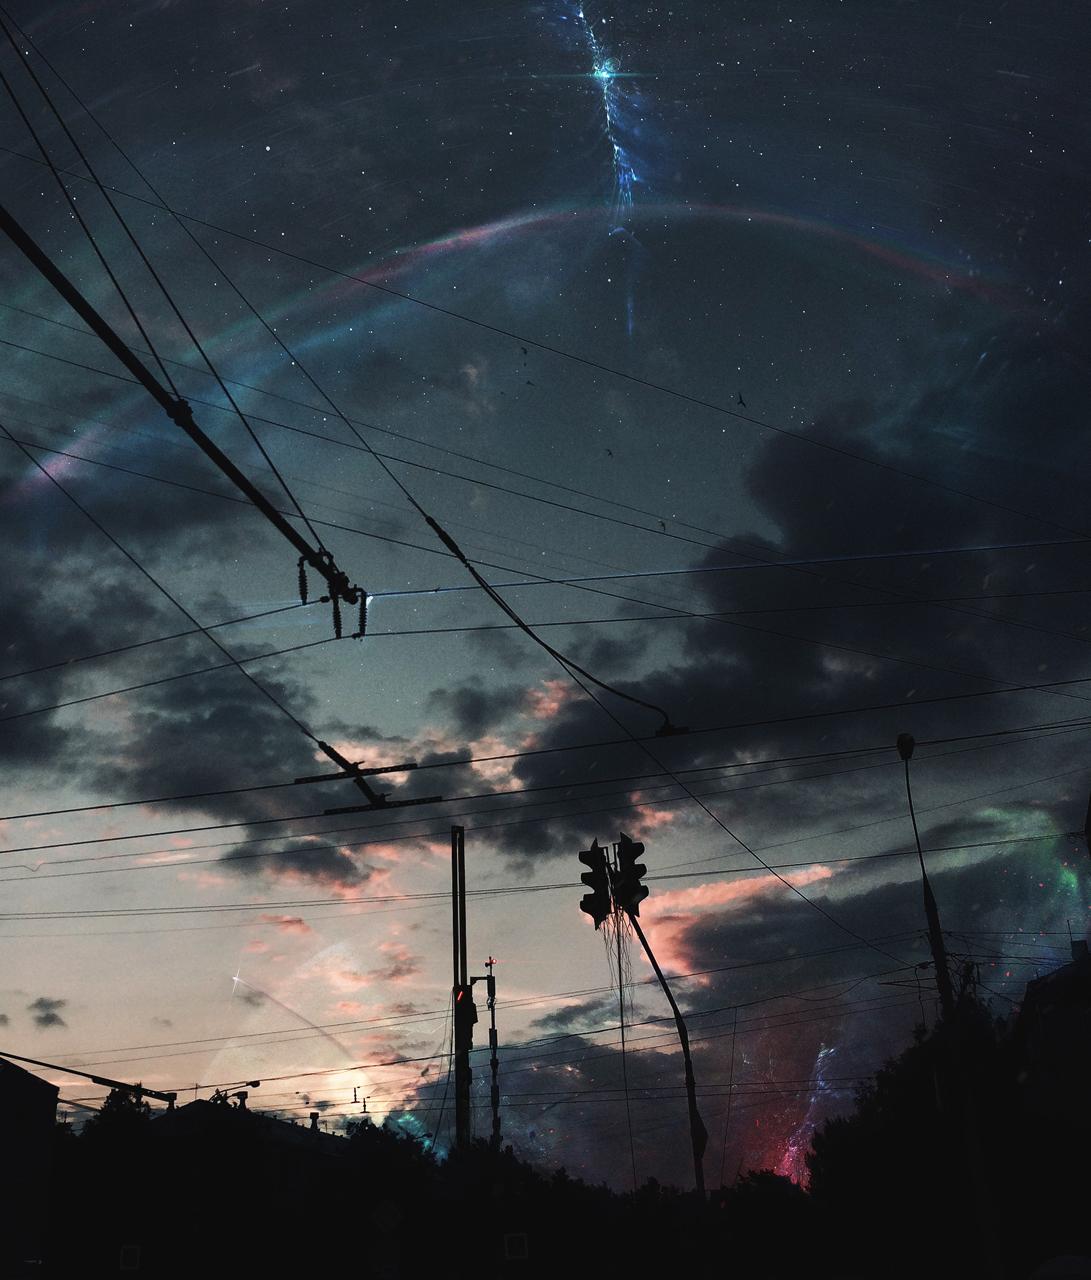 General 1091x1280 Ilya Baver space street wire photo manipulation digital art